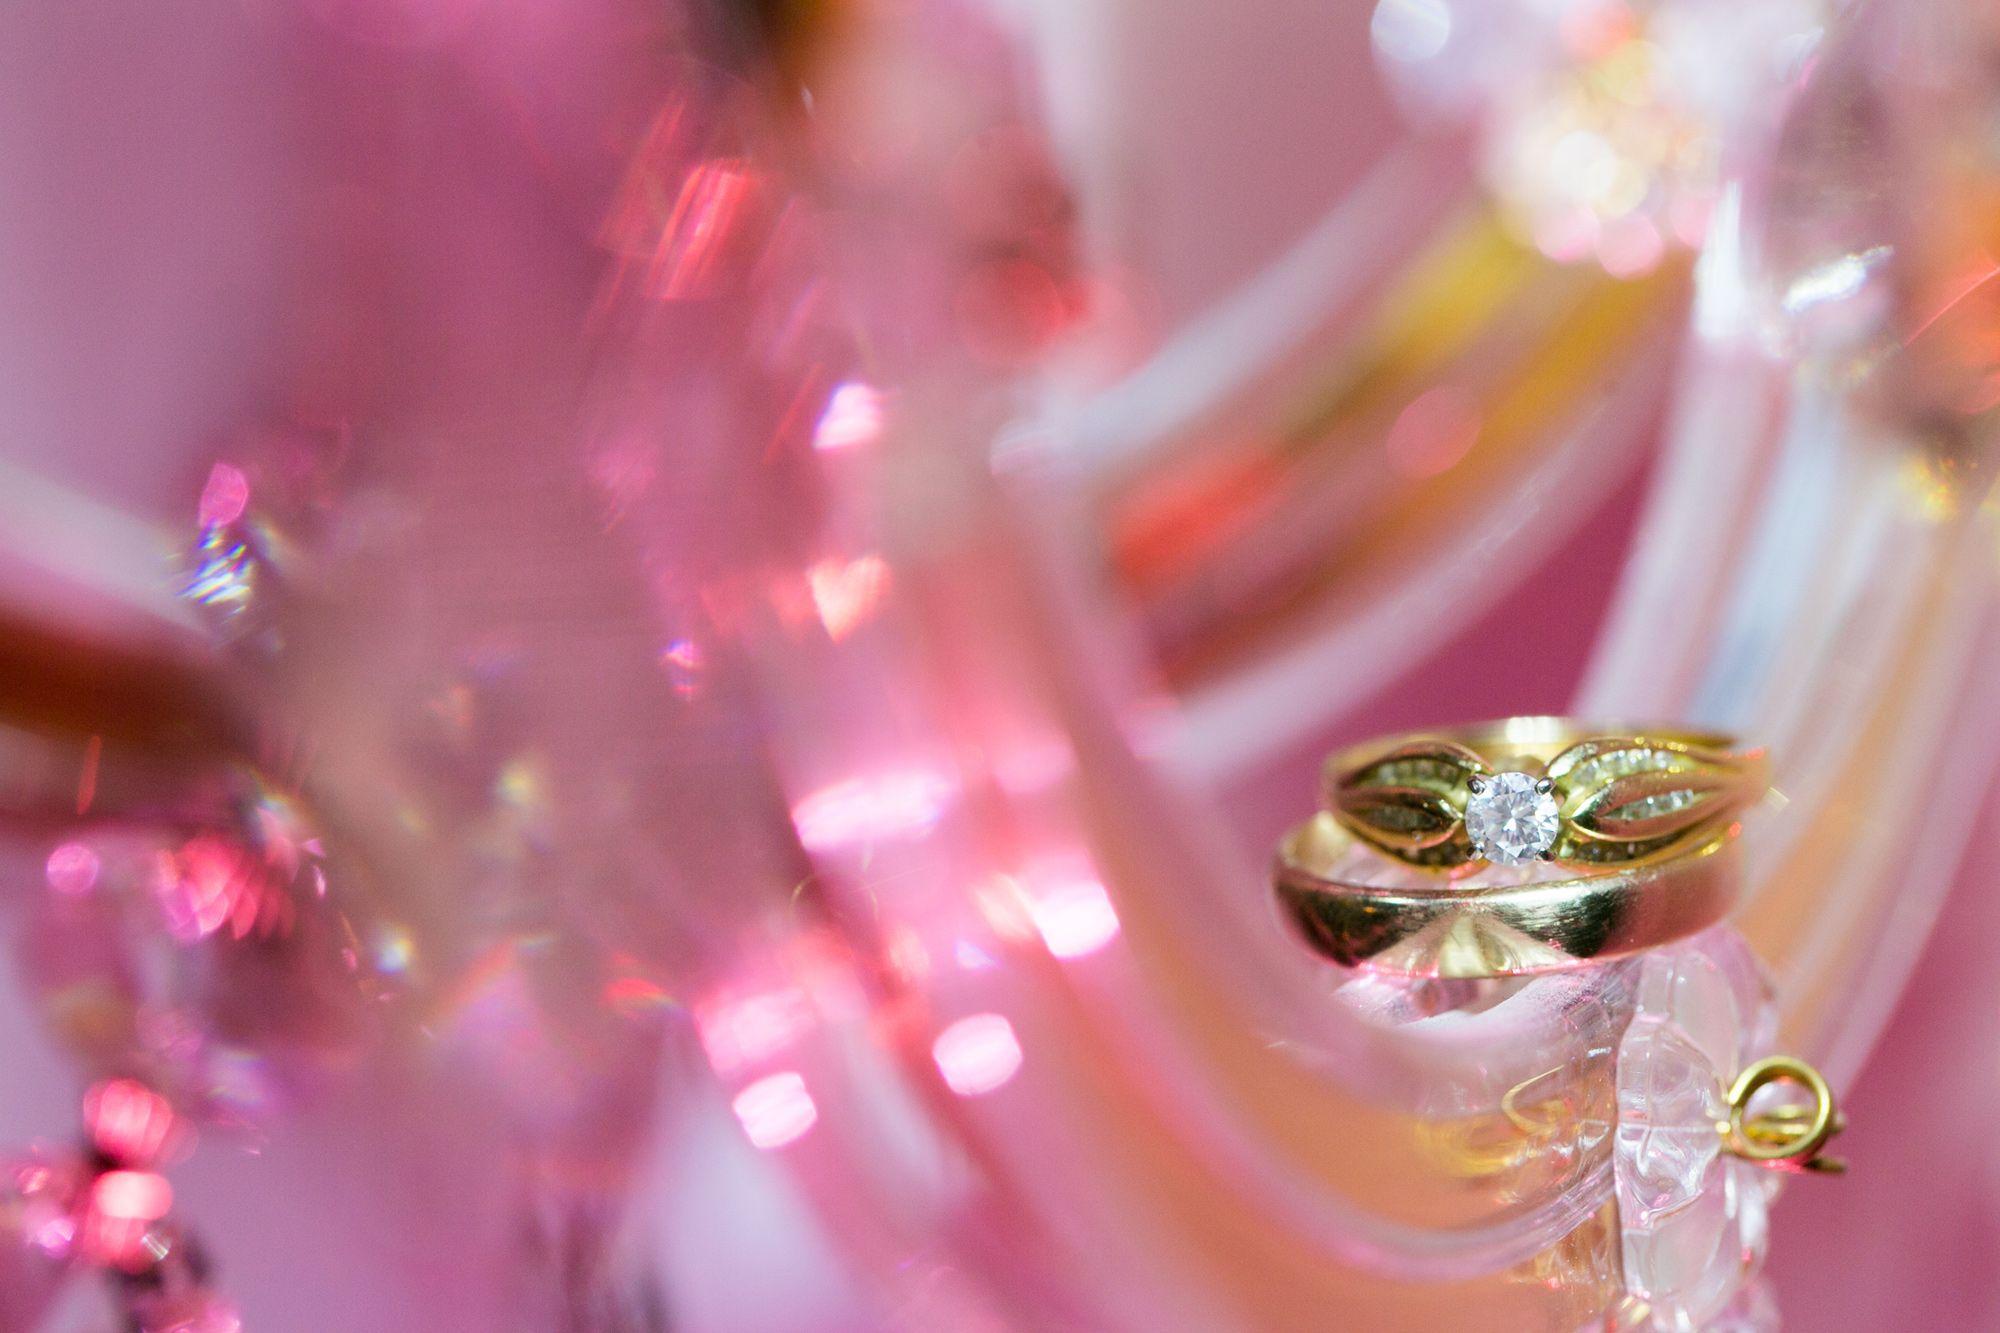 Follow me for beautiful wedding photography images - Halifax Wedding ...